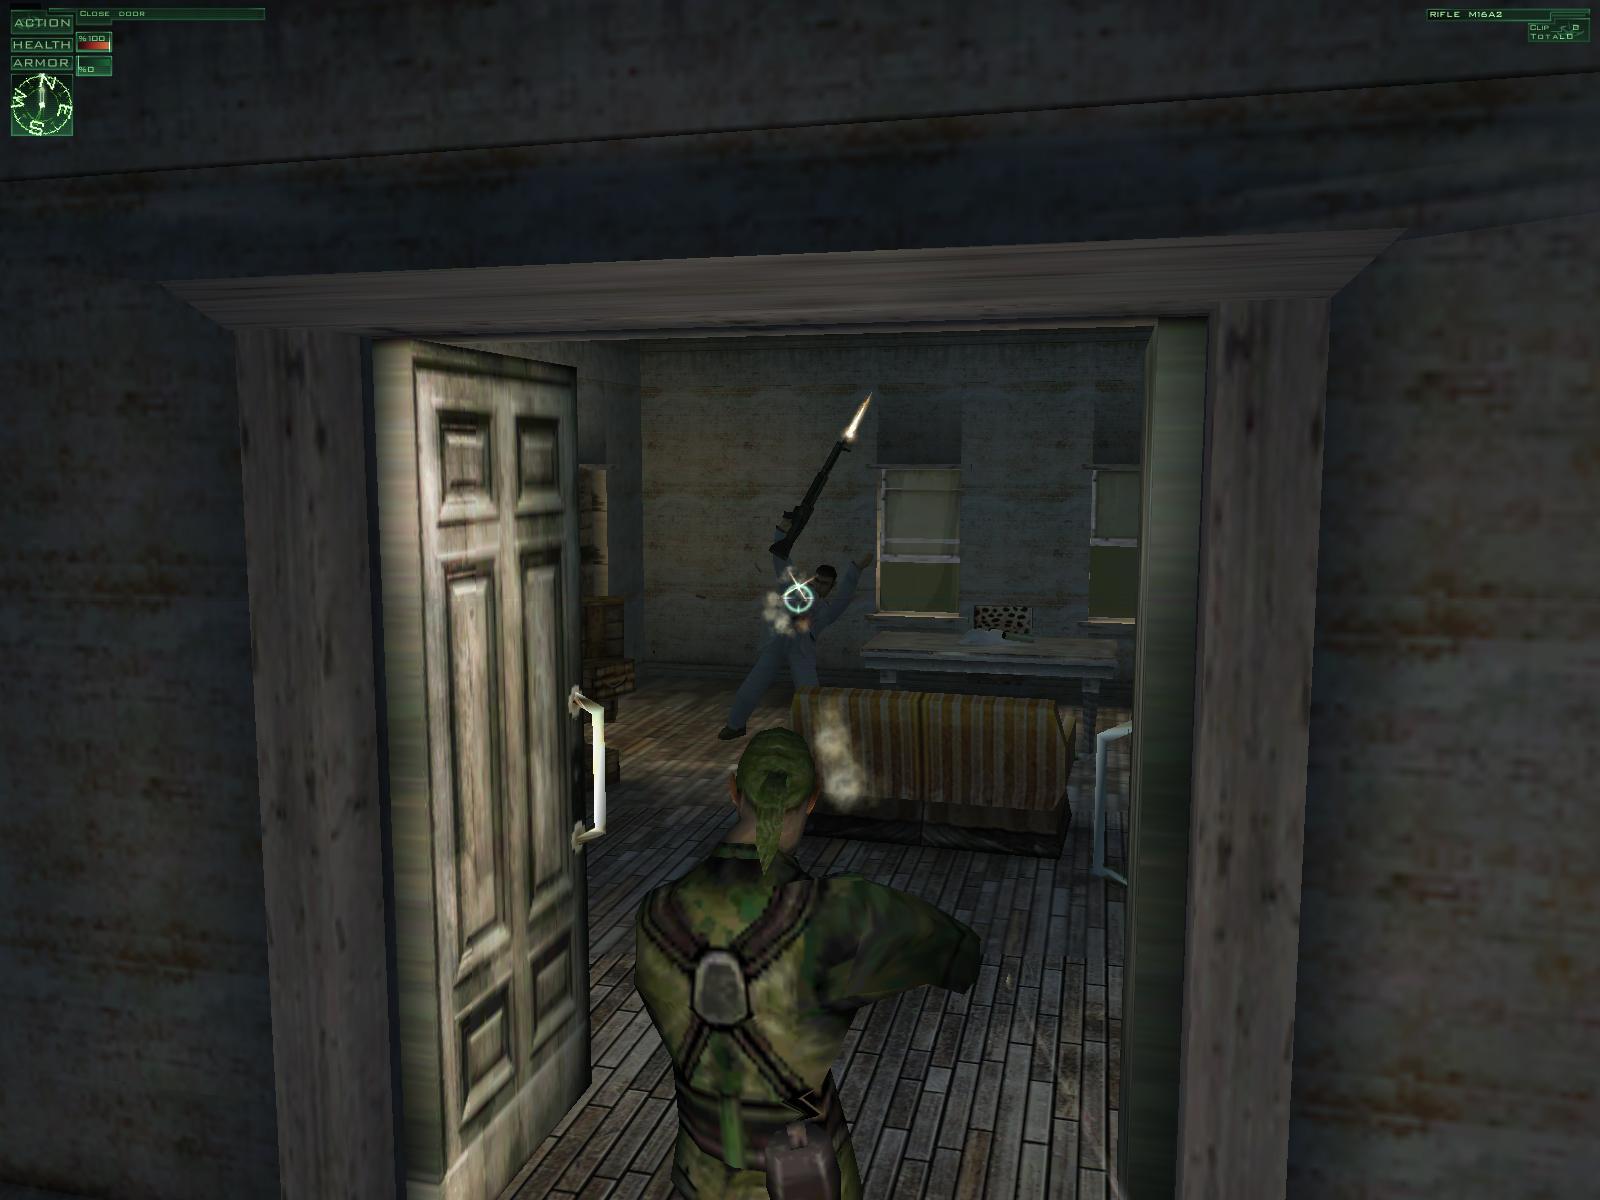 Обзор игры Hitman Codename 47. Чит-коды к игре Hitman Codename.